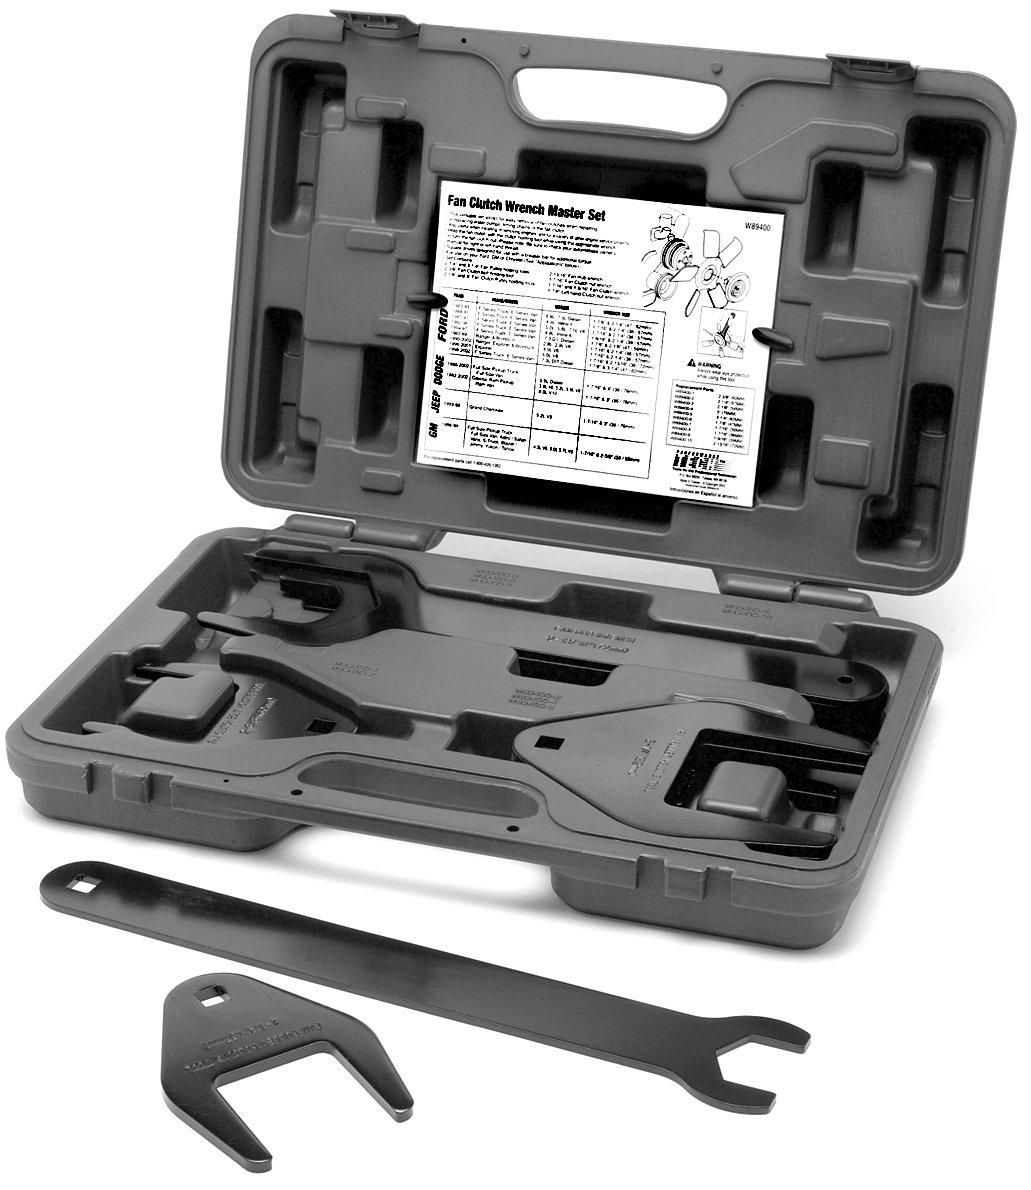 Performance Tool W89400 10-Piece Fan Clutch Wrench Set Wilmar Performance Tool